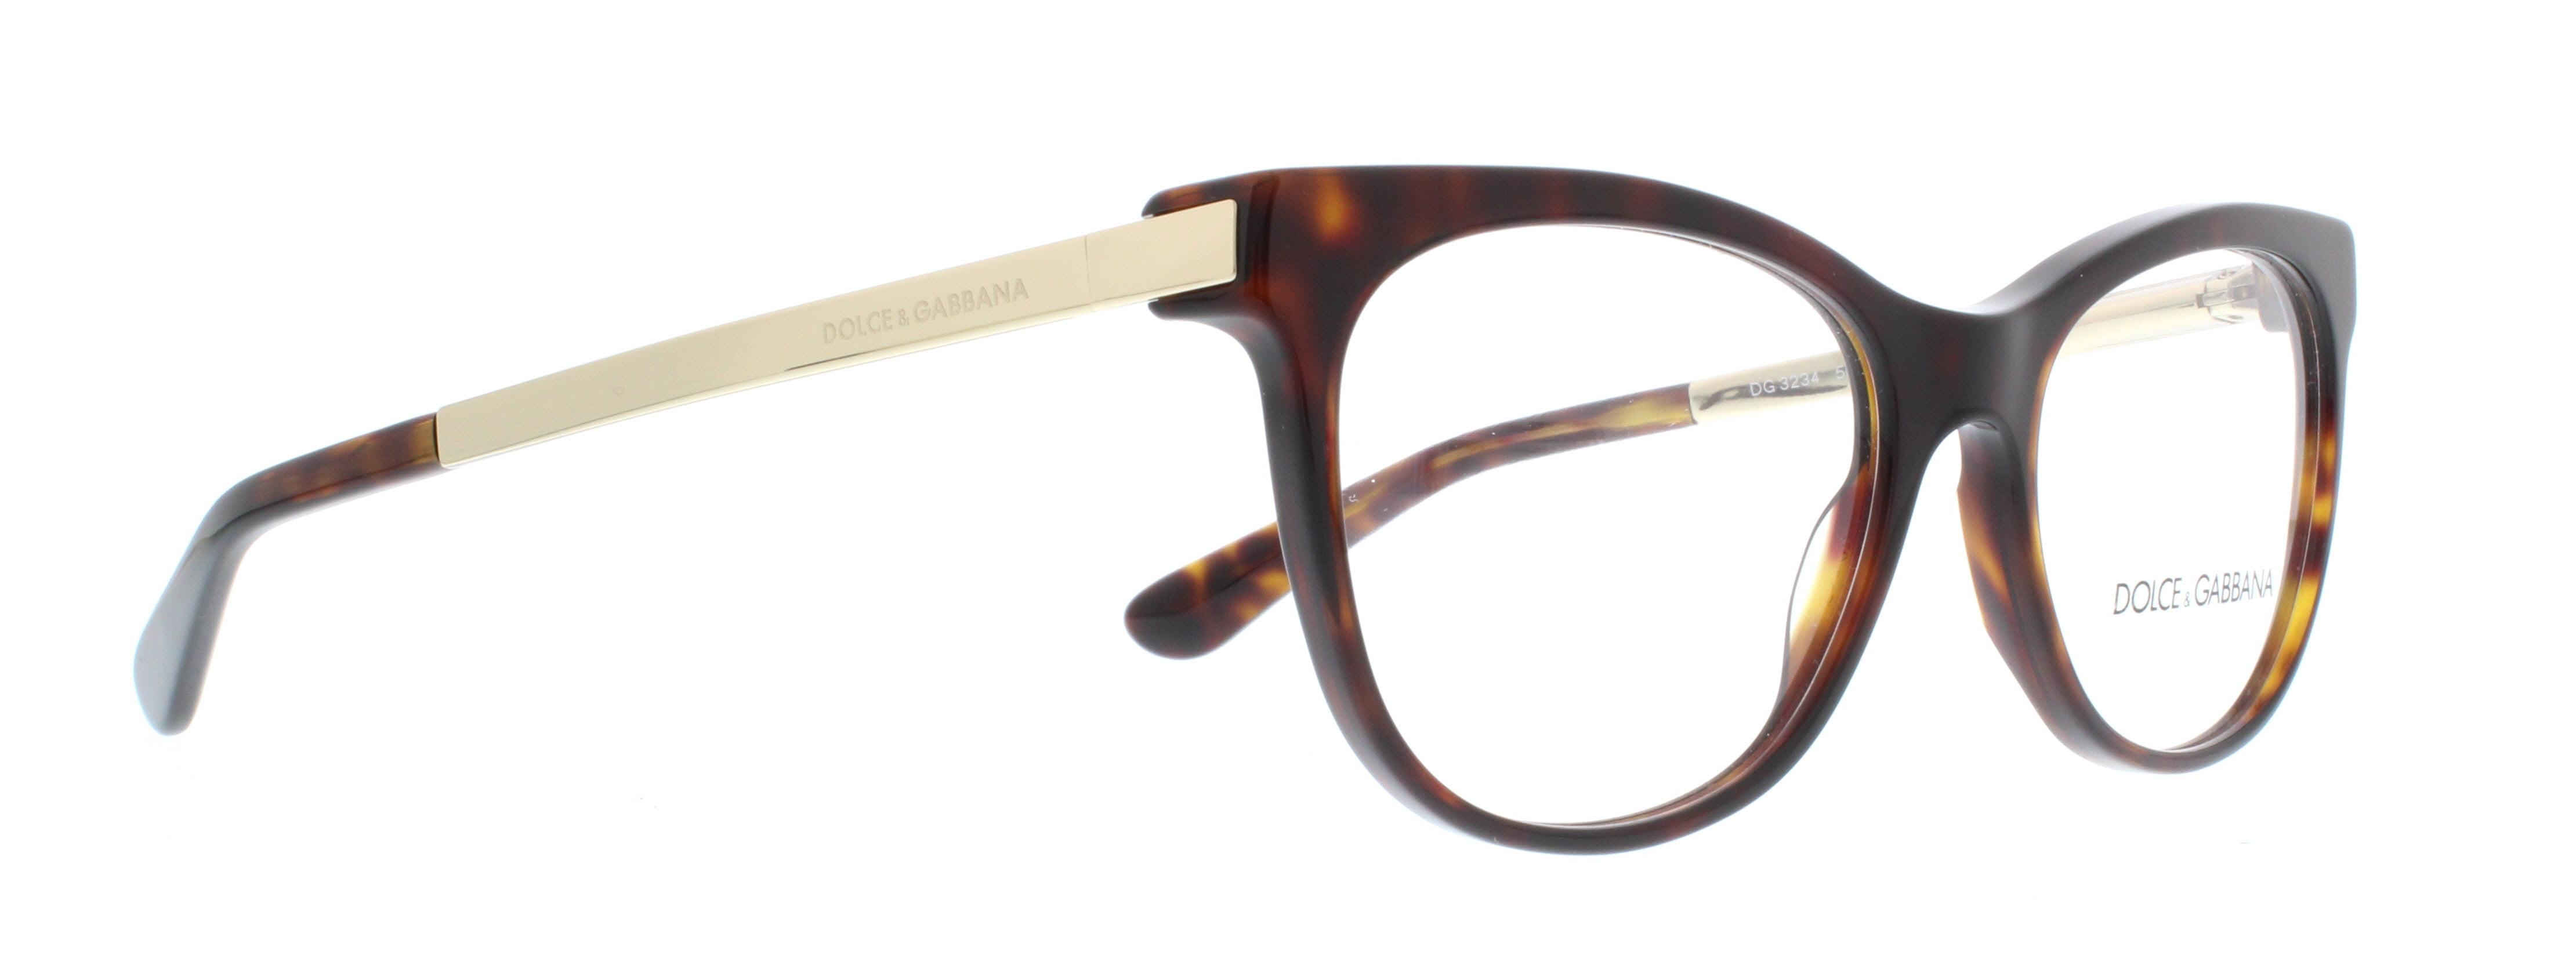 6ddfea1476a17 DOLCE   GABBANA Eyeglasses DG 3234 502 Havana 52MM - Walmart.com